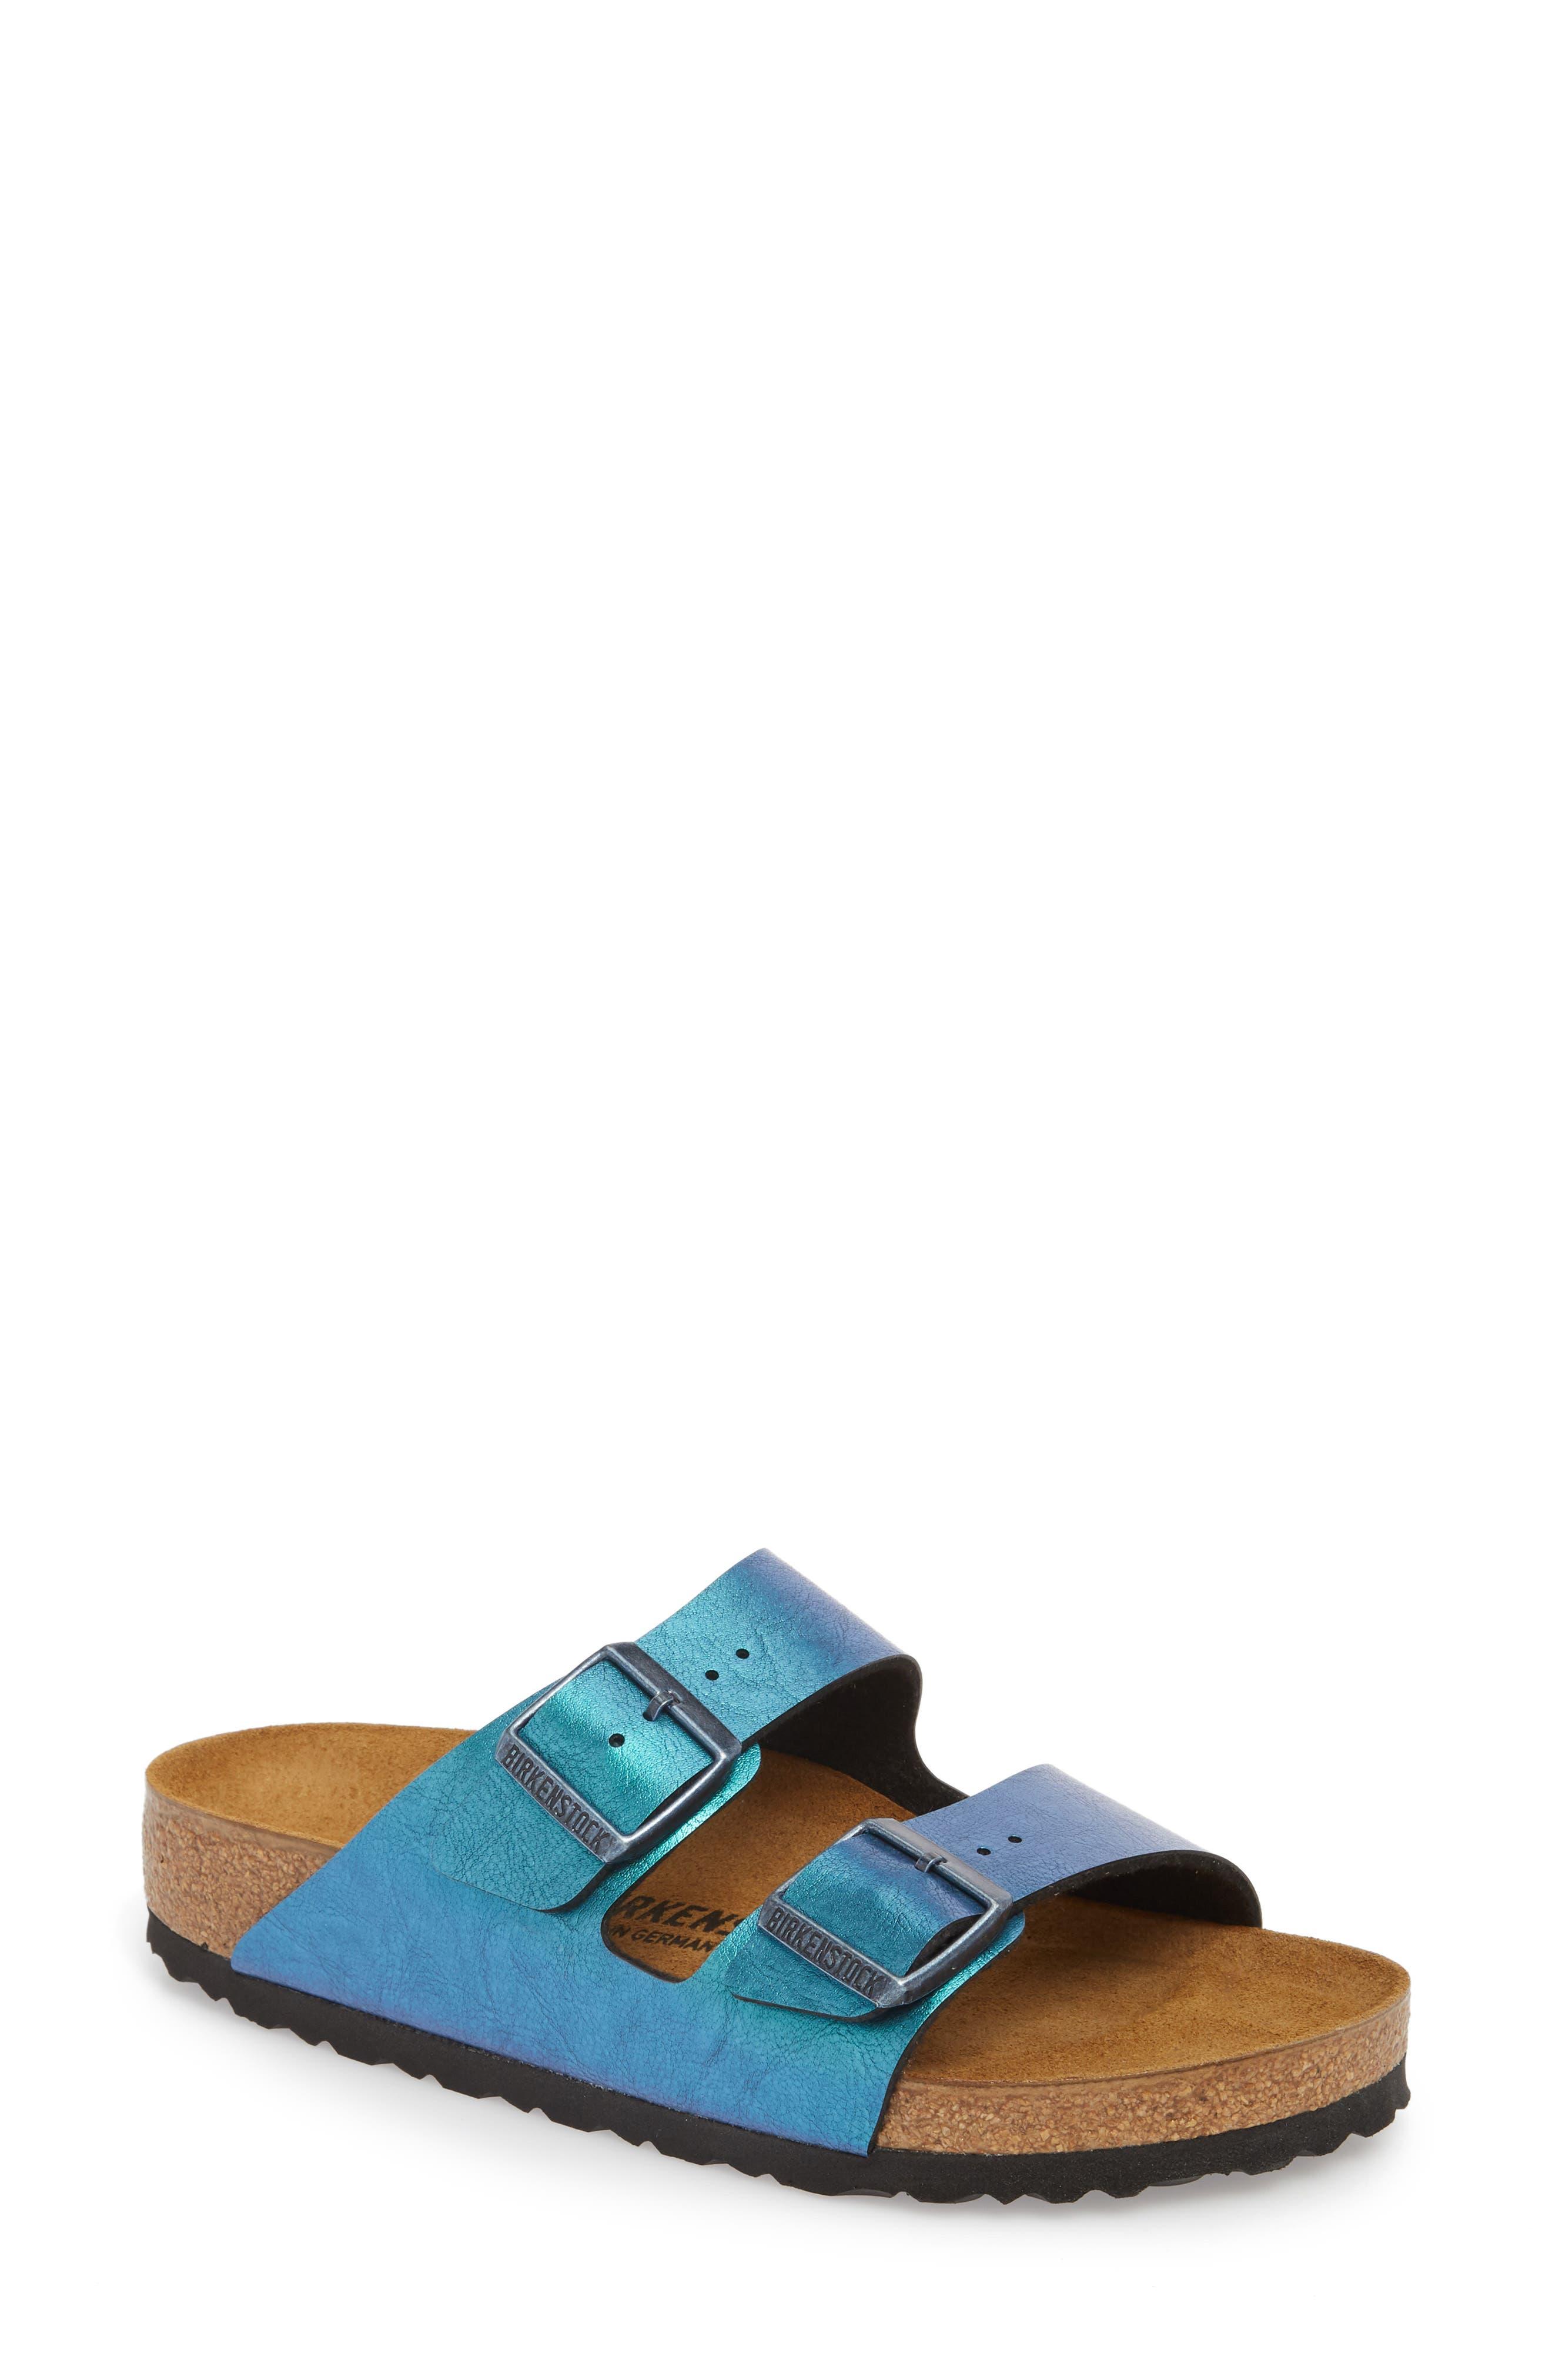 Arizona Graceful Birko-Flor<sup>™</sup> Sandal,                             Main thumbnail 1, color,                             400